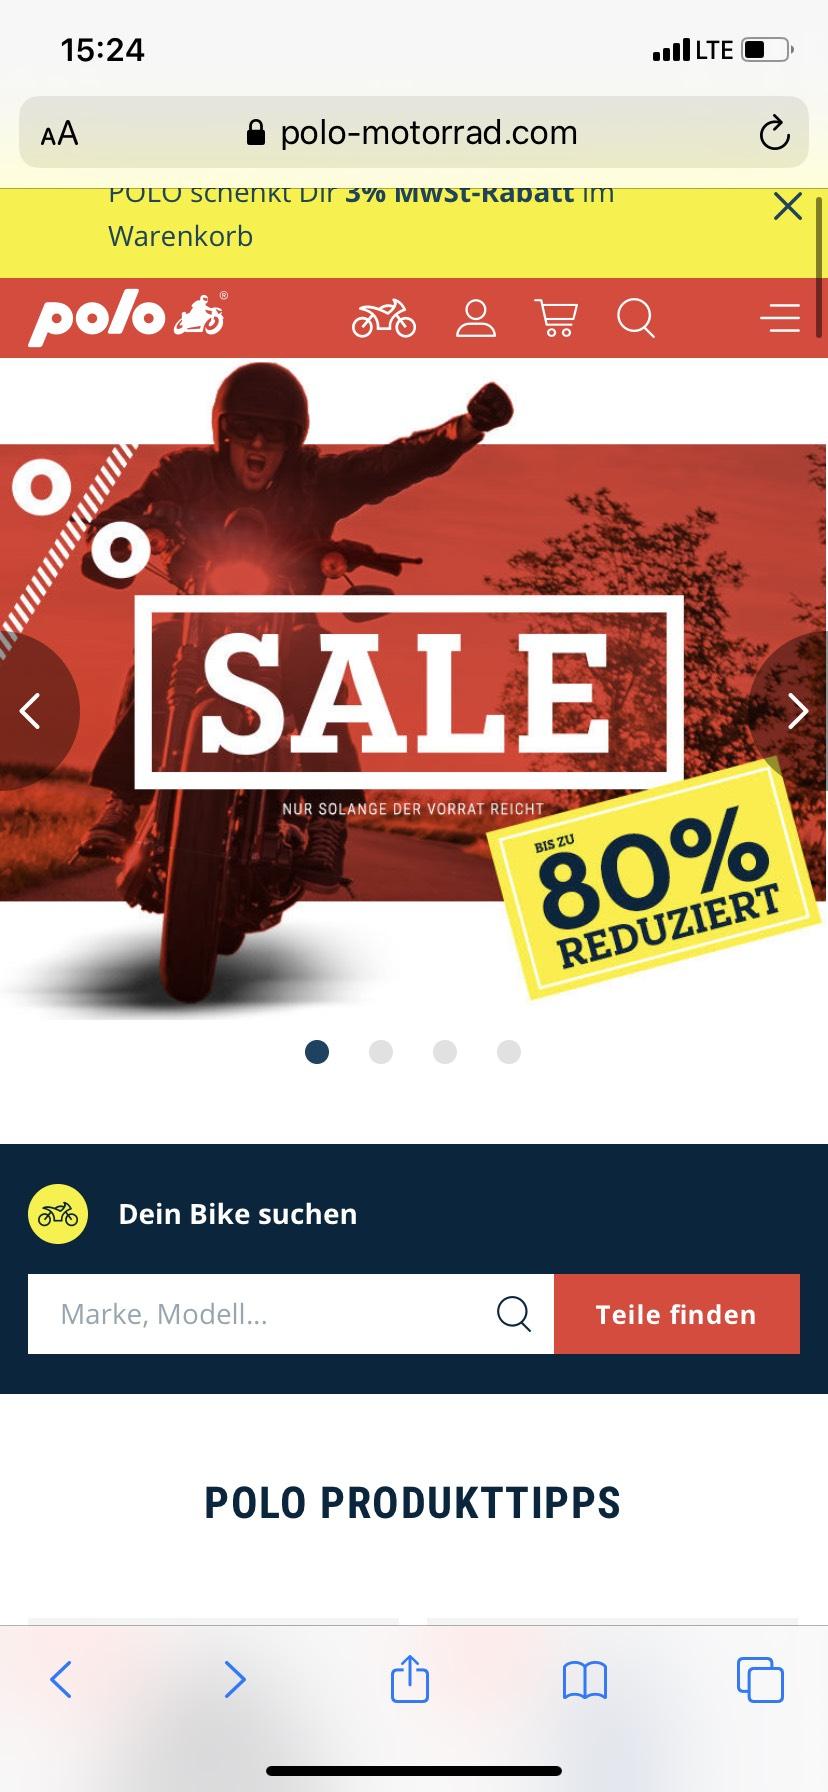 Polo-Motorrad: Bis zu 80% Rabatt + gratis Versand